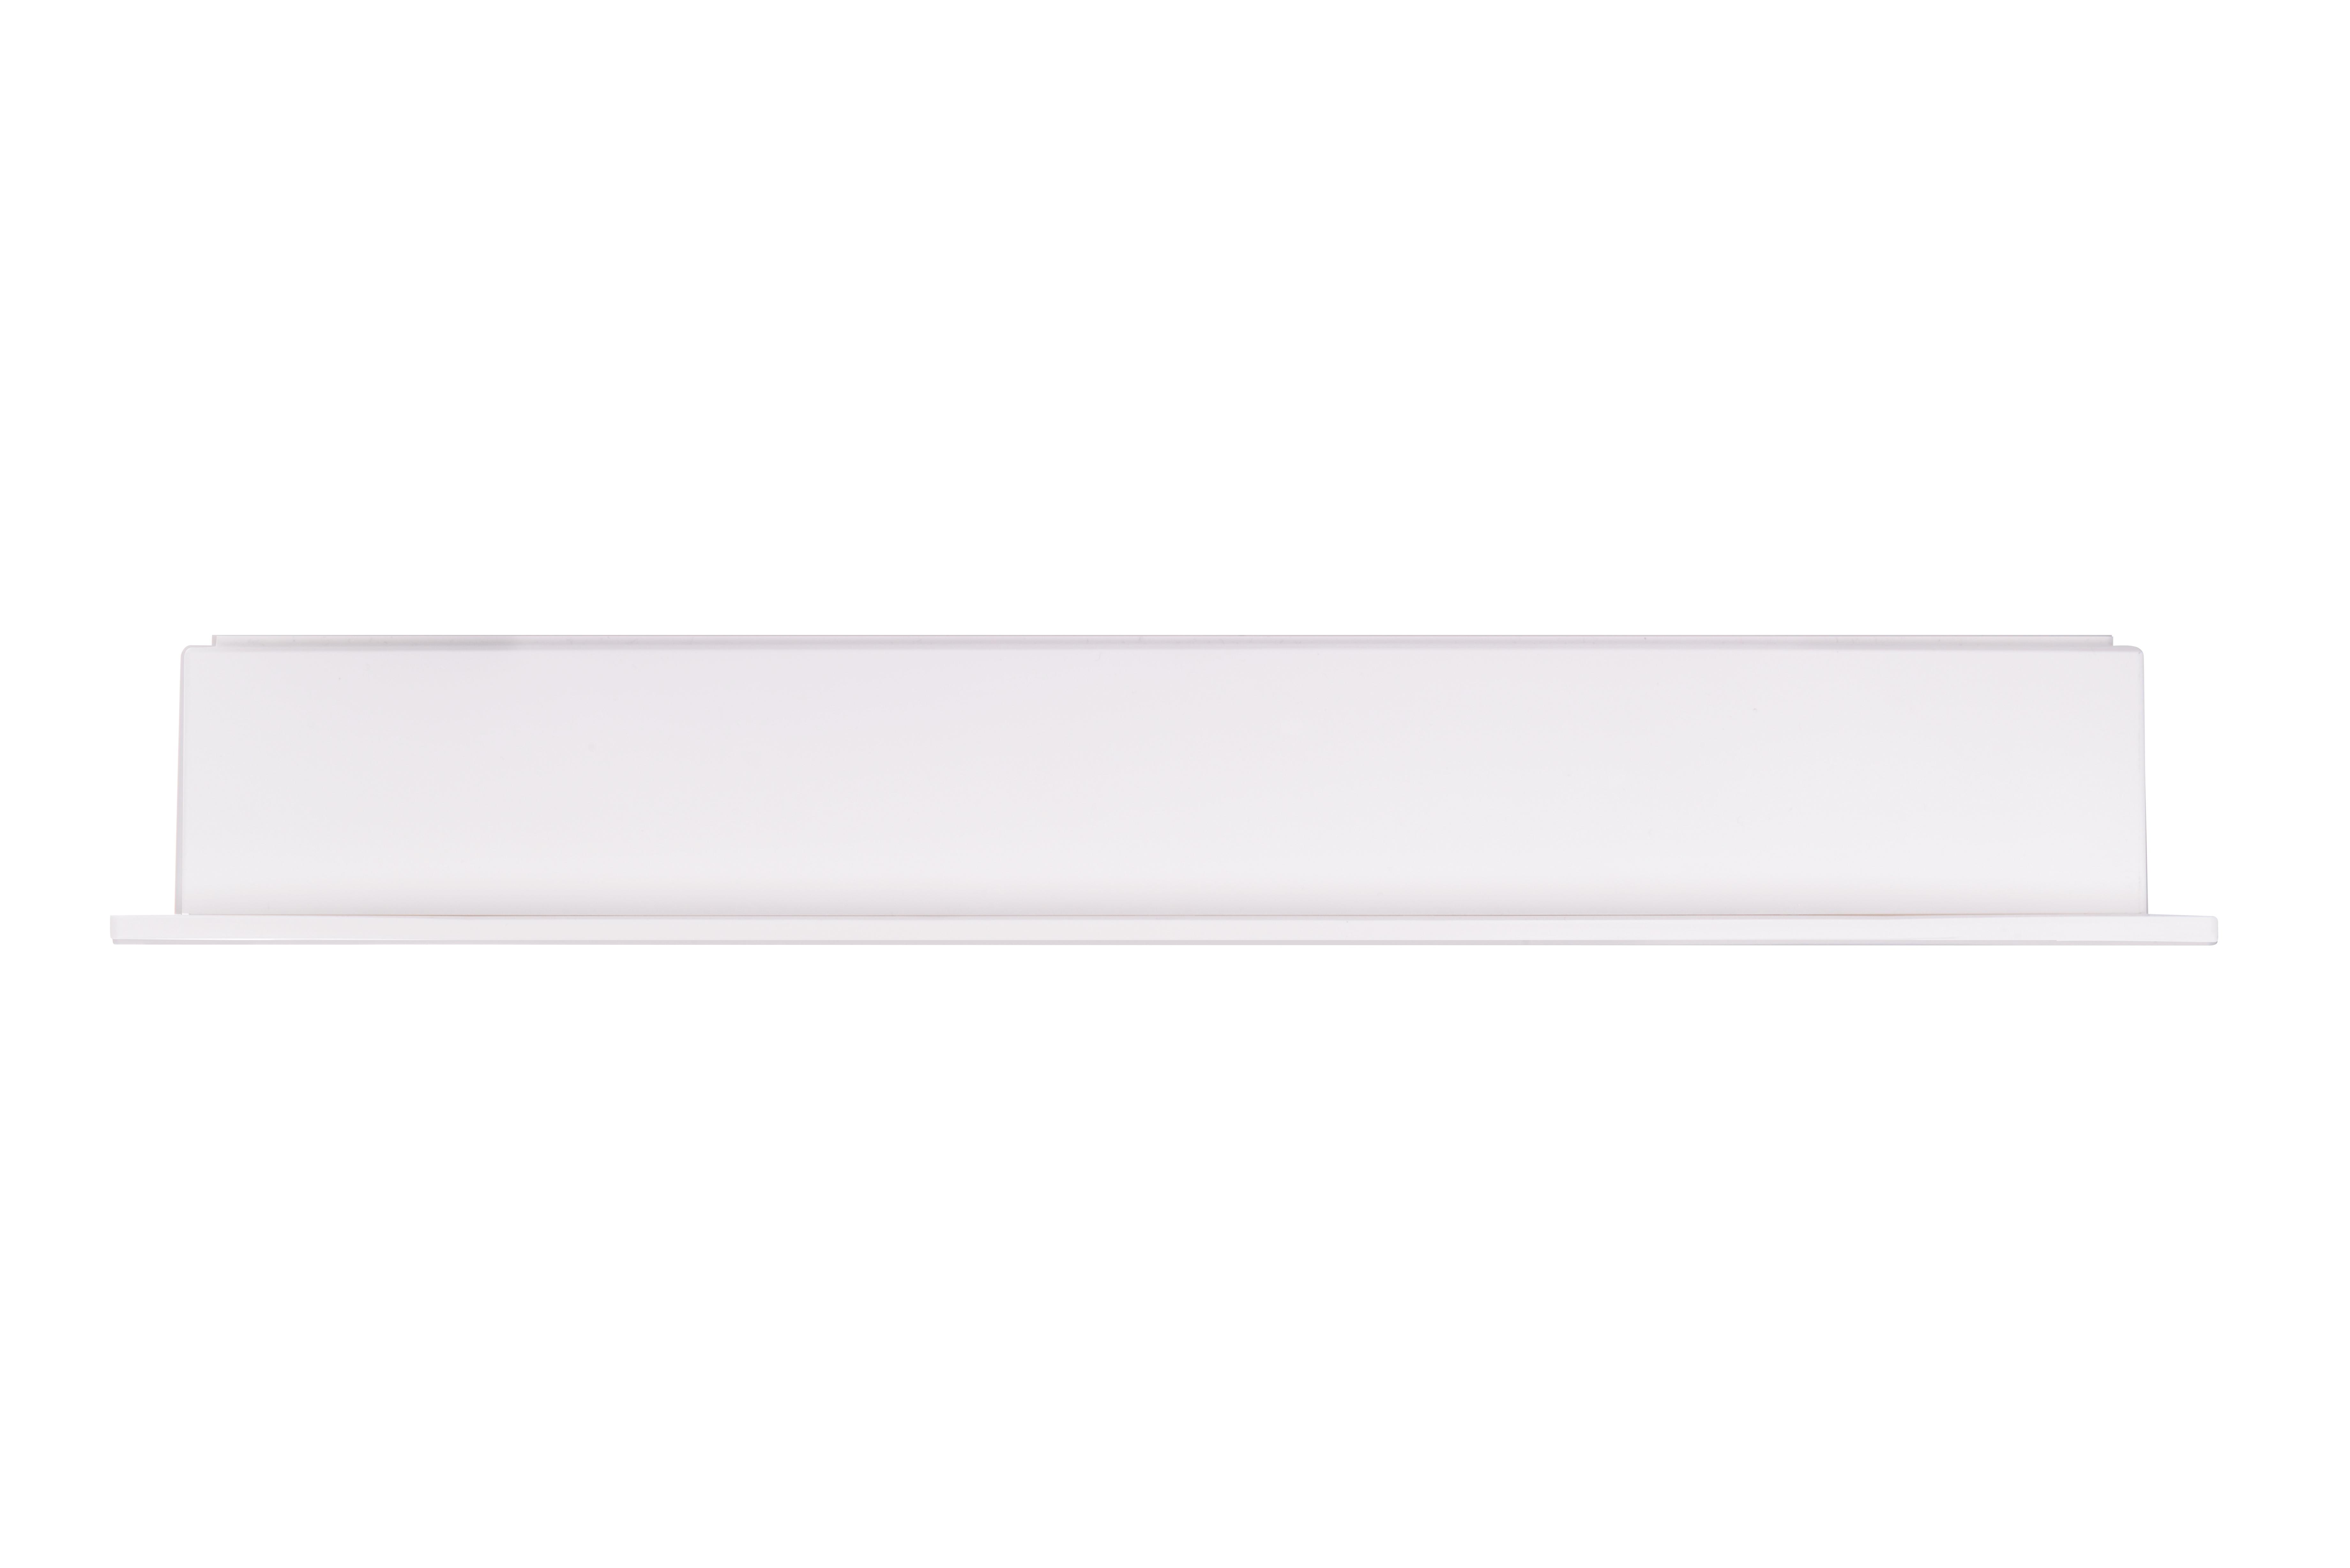 Lampa antipanica led Intelight 94710   3h mentinut test automat 5